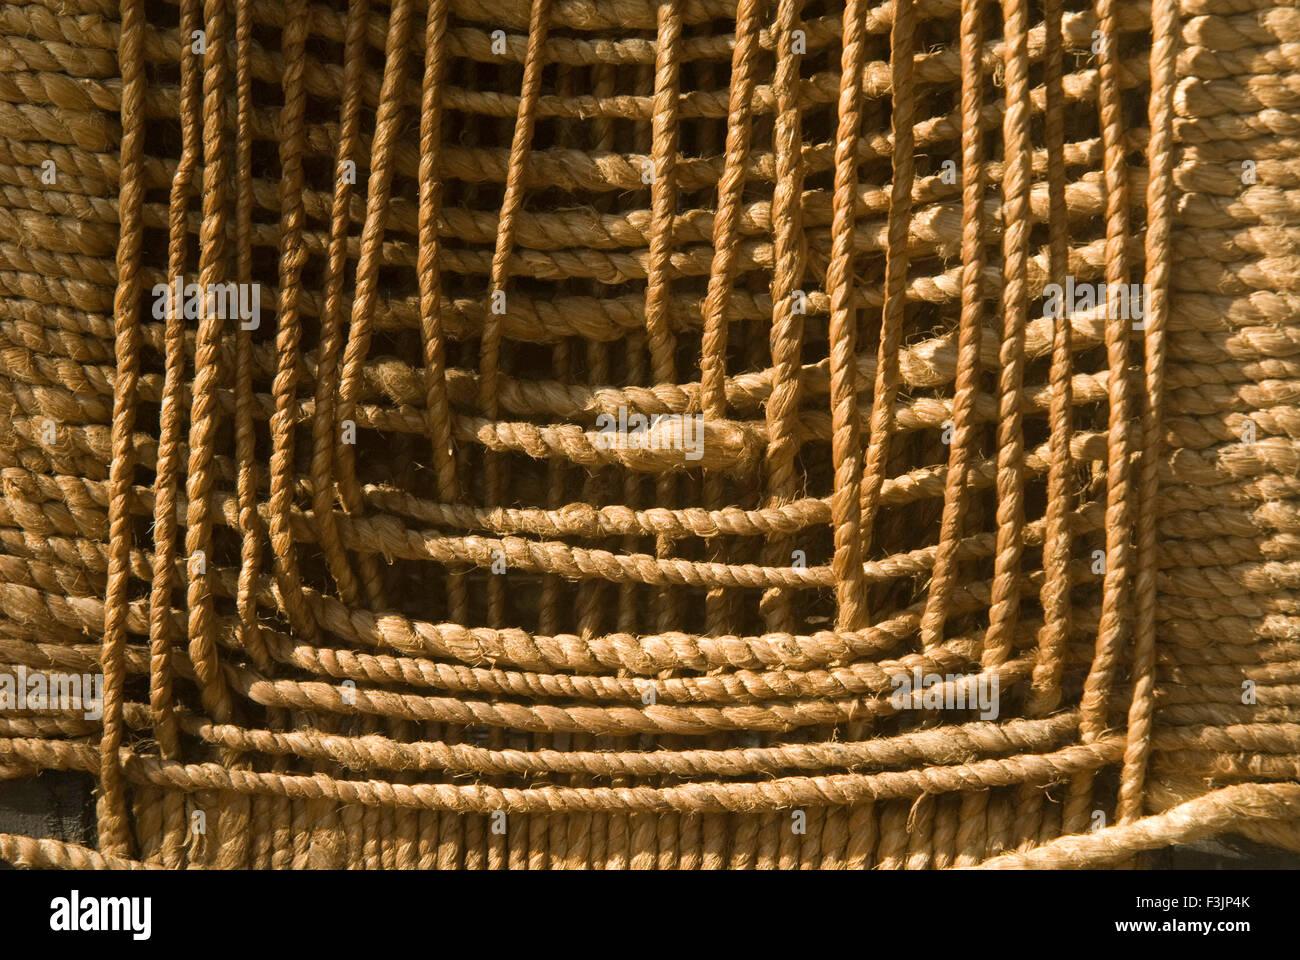 Jute chair at Varun farm Usarli village taluka Panvel Maharashtra India - Stock Image